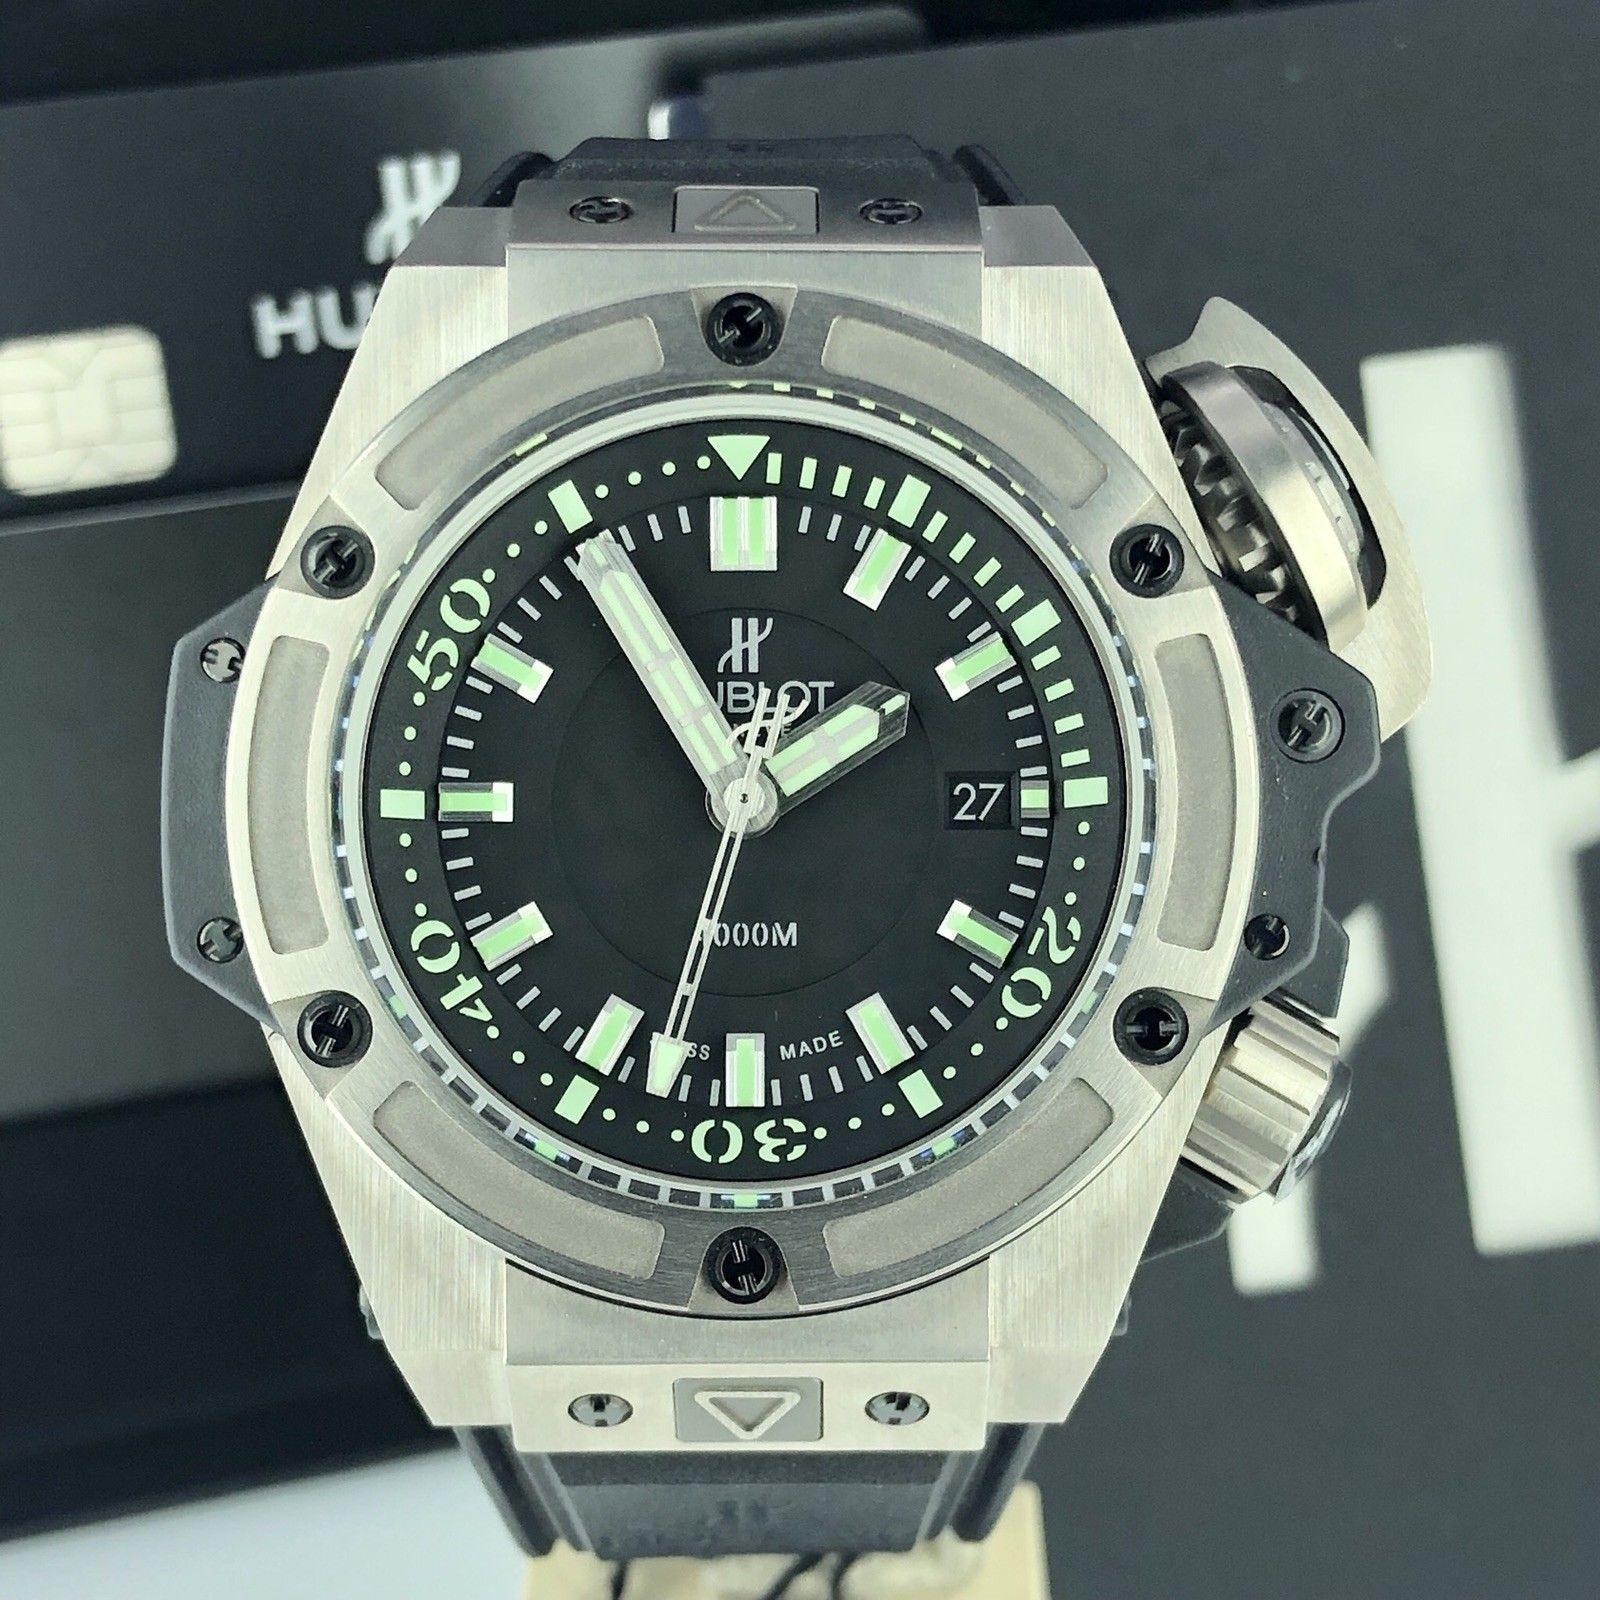 FS- Hublot 731.NX.1190.RX Big Bang King Power